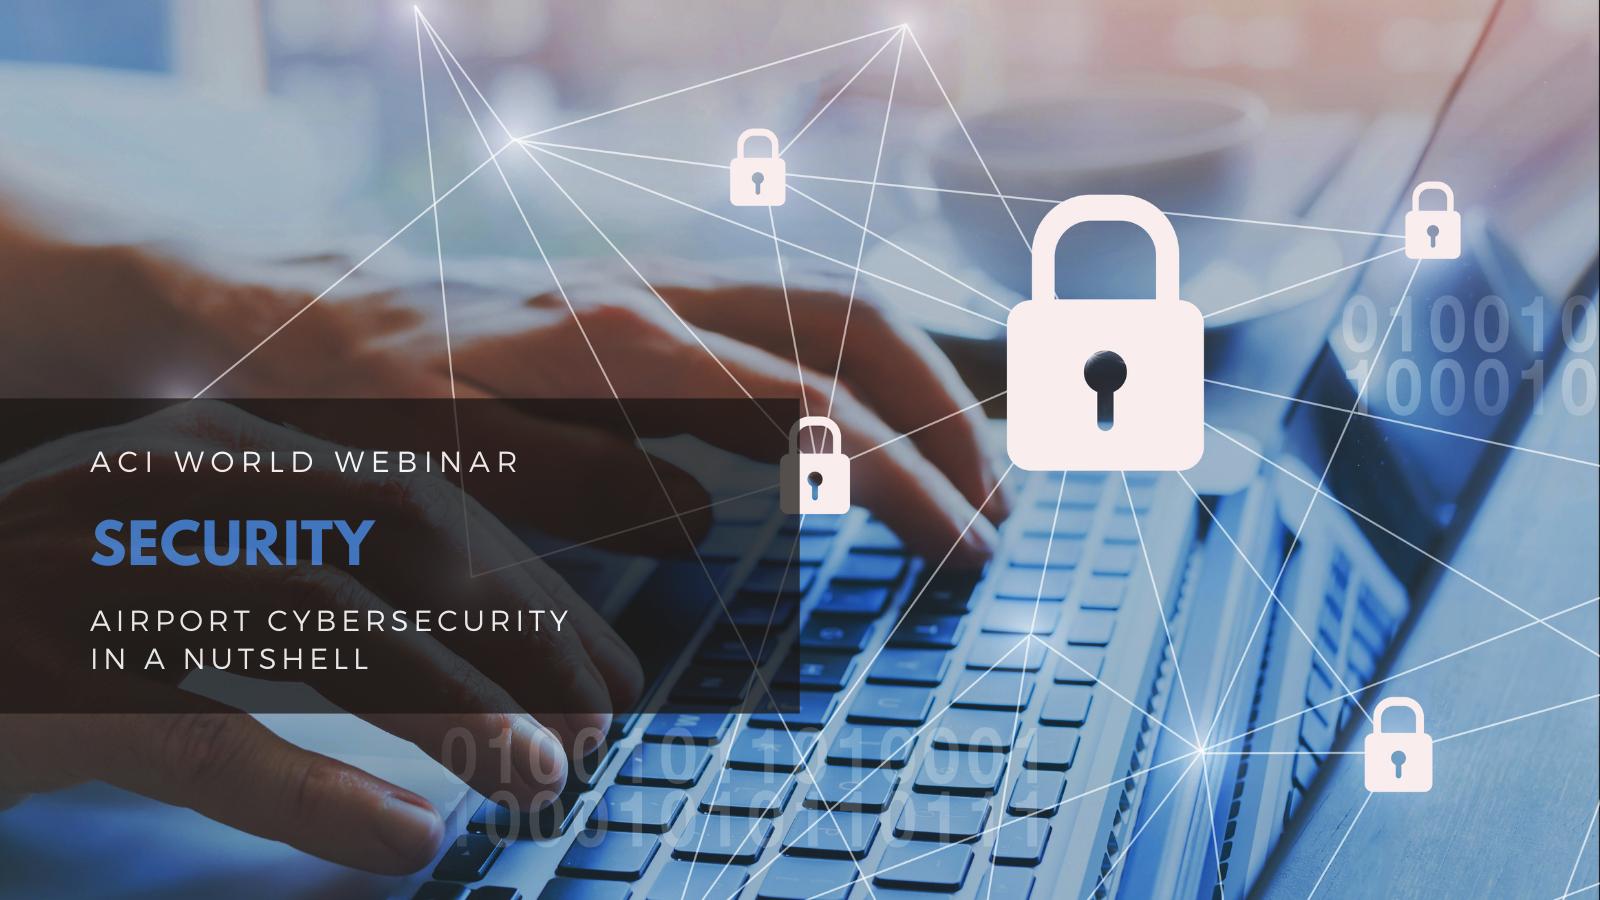 Cybersecurity webinar - website image